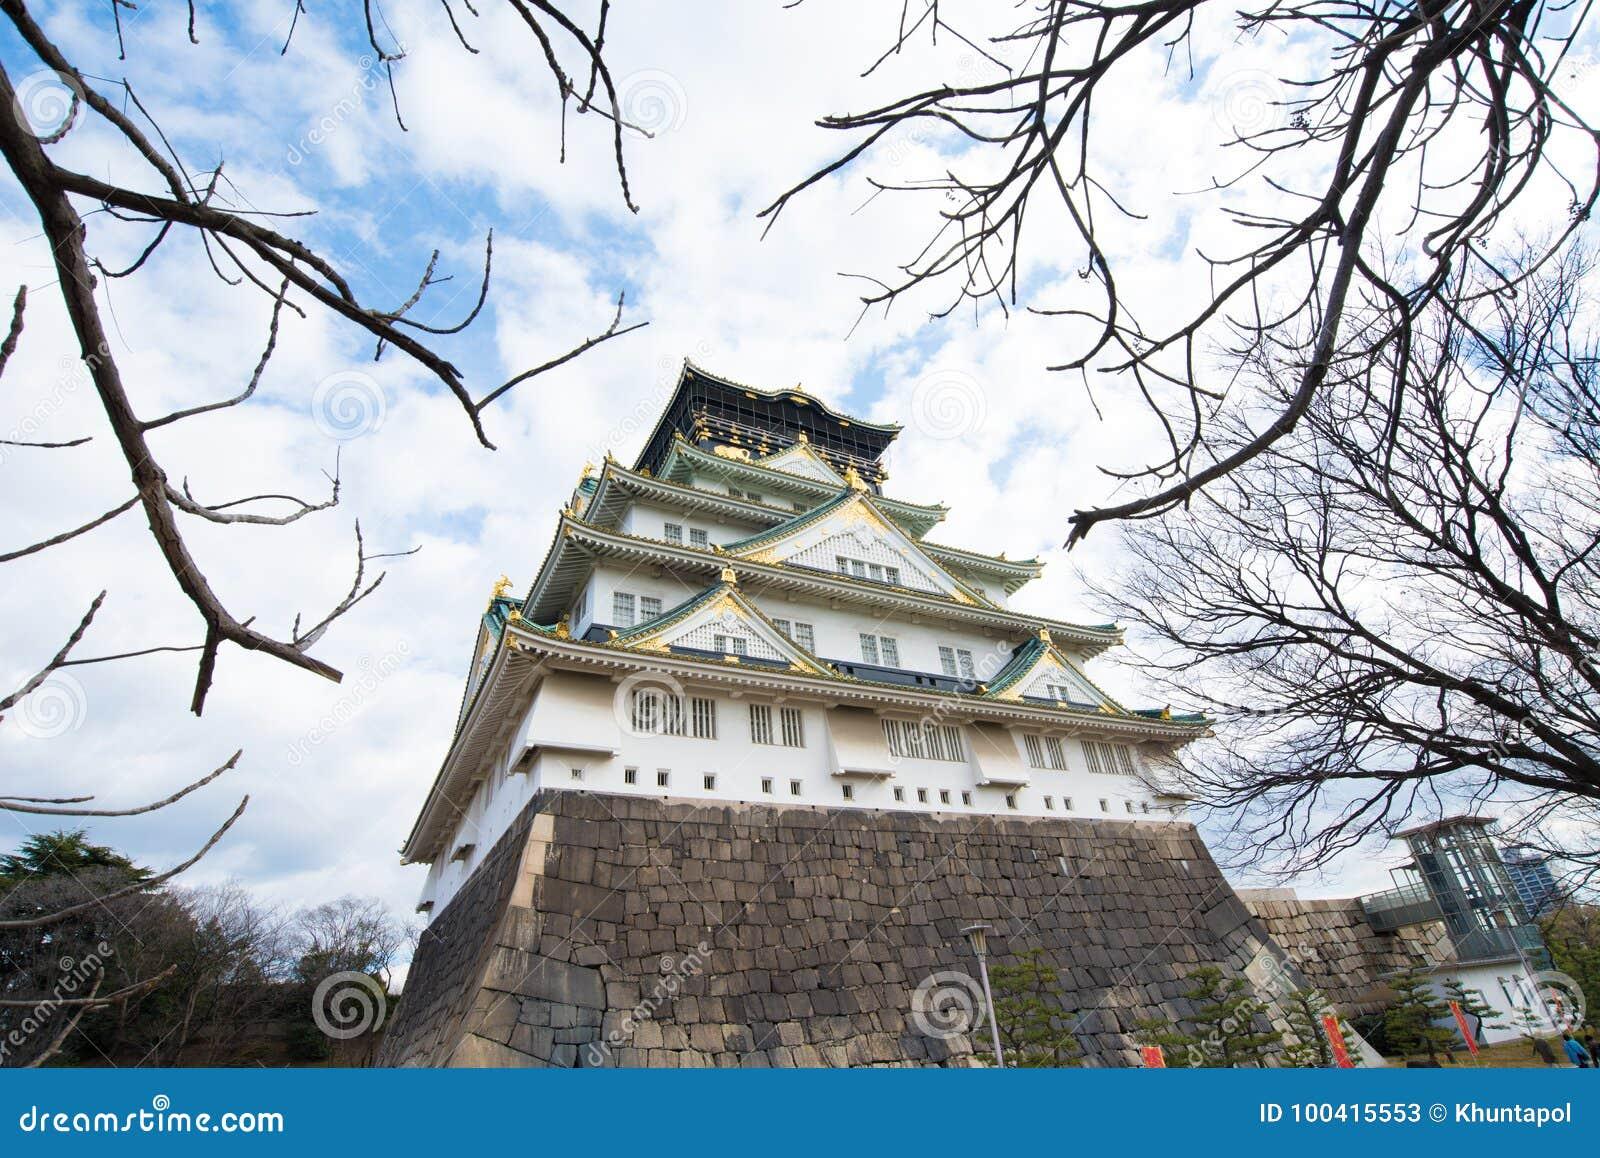 the beautiful osaka castle in winter of osaka japan stock. Black Bedroom Furniture Sets. Home Design Ideas